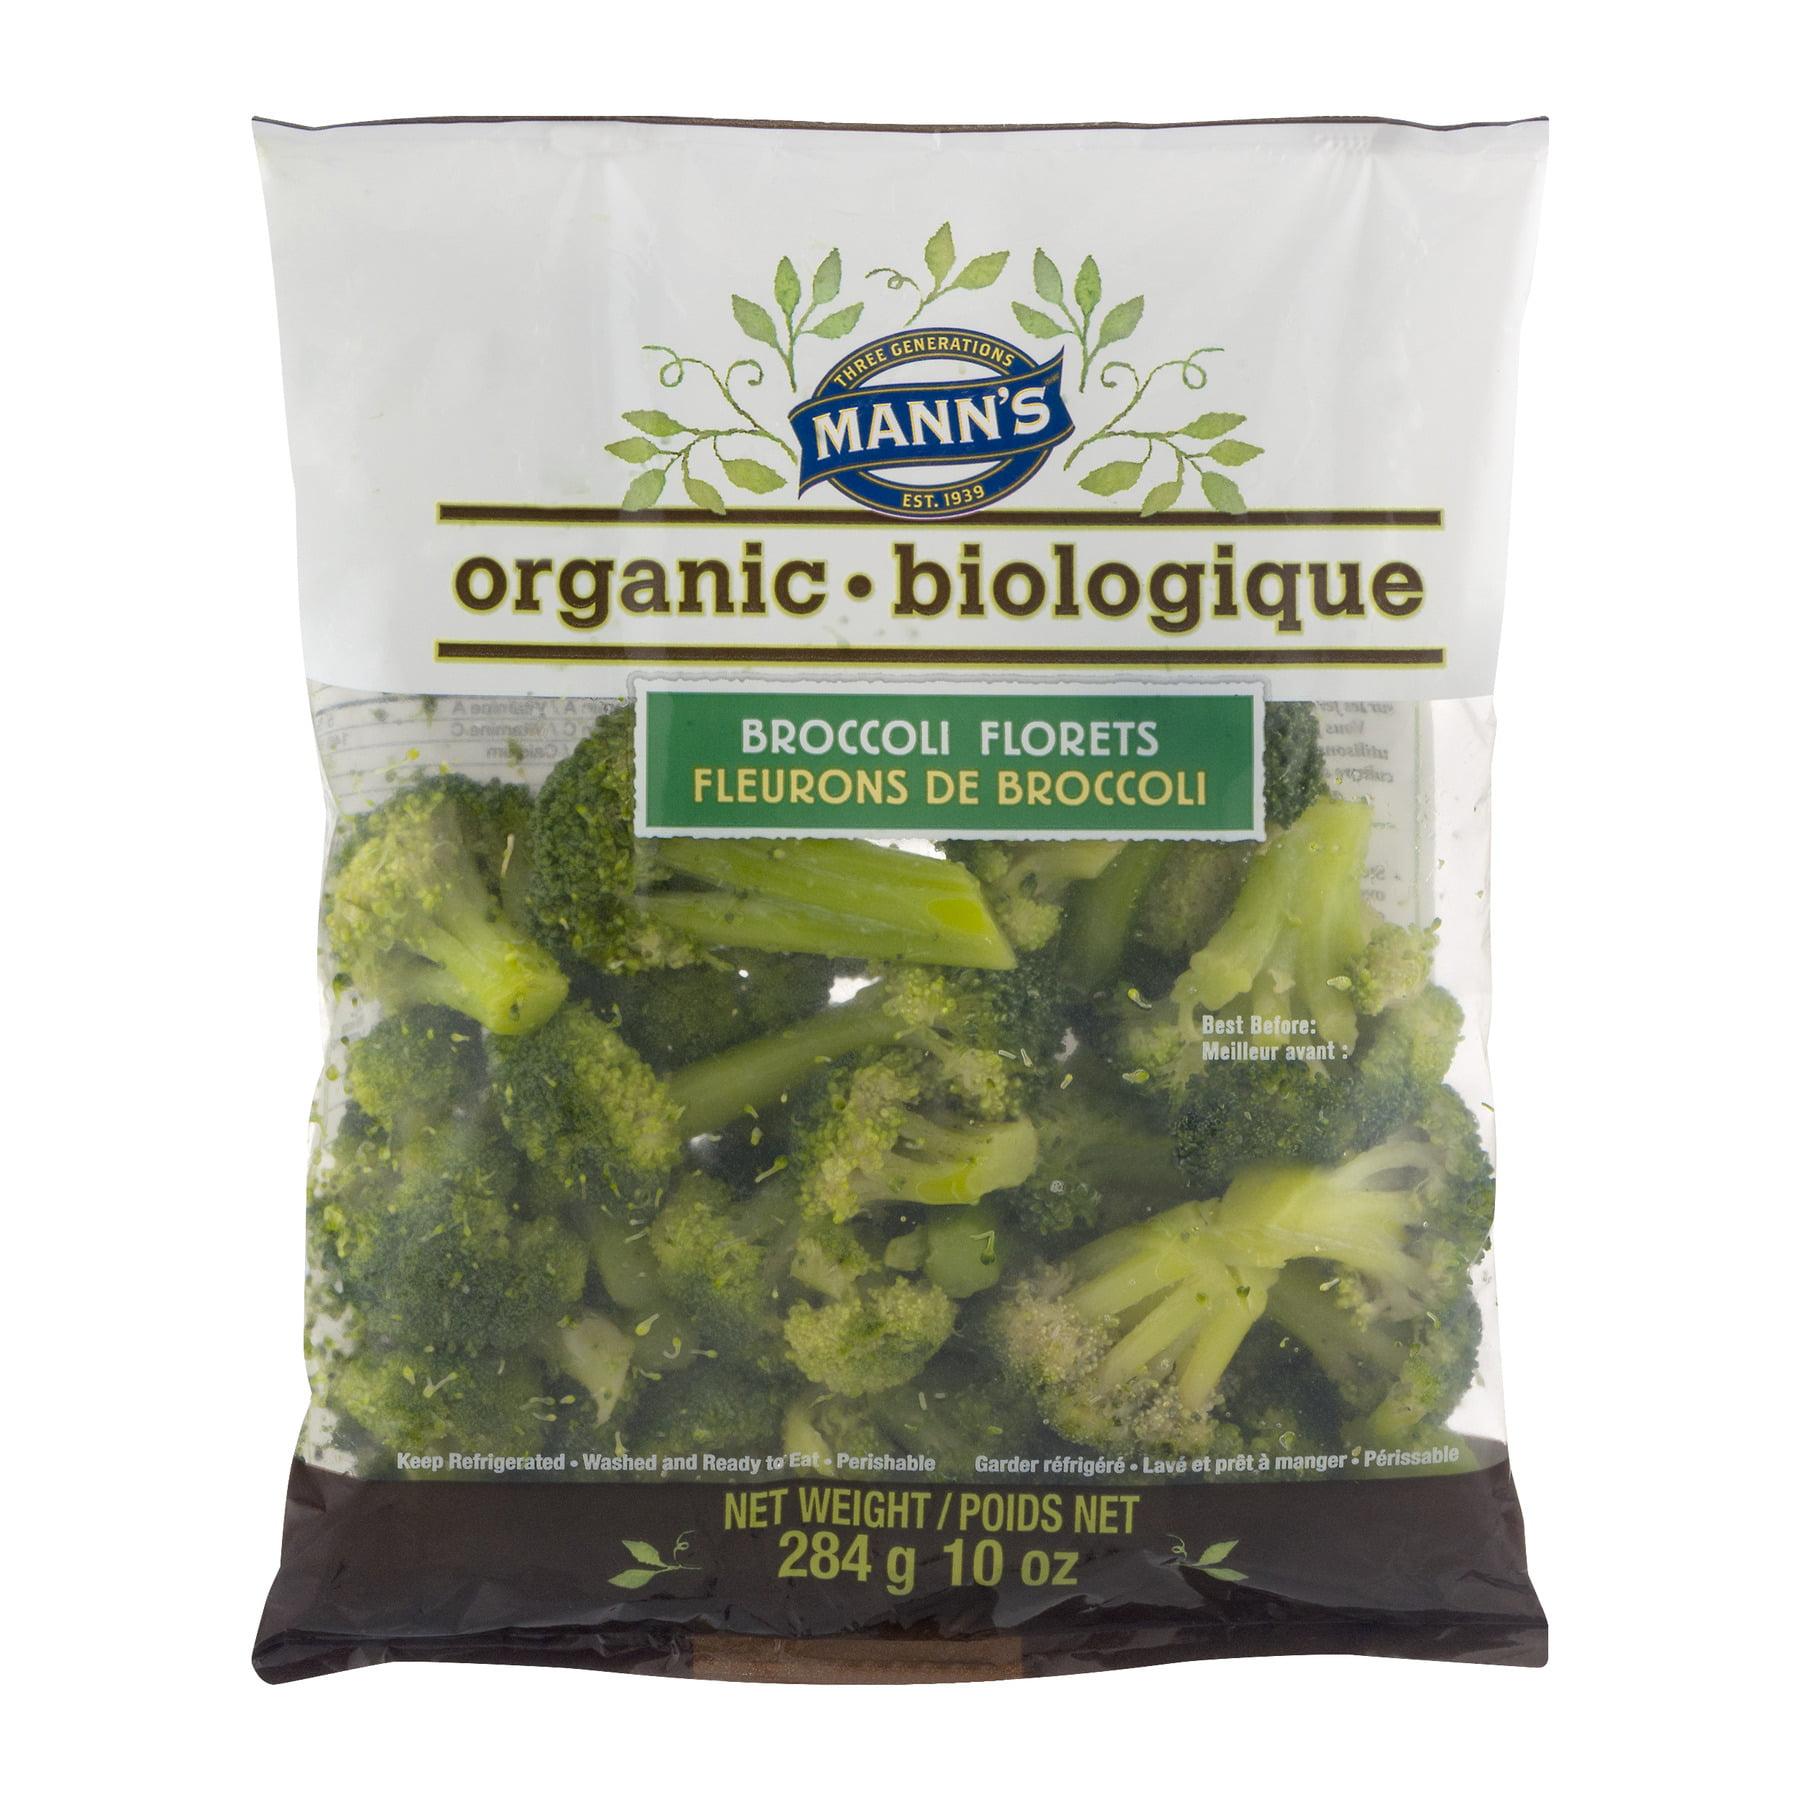 Mann Packing Manns  Broccoli Florets, 10 oz